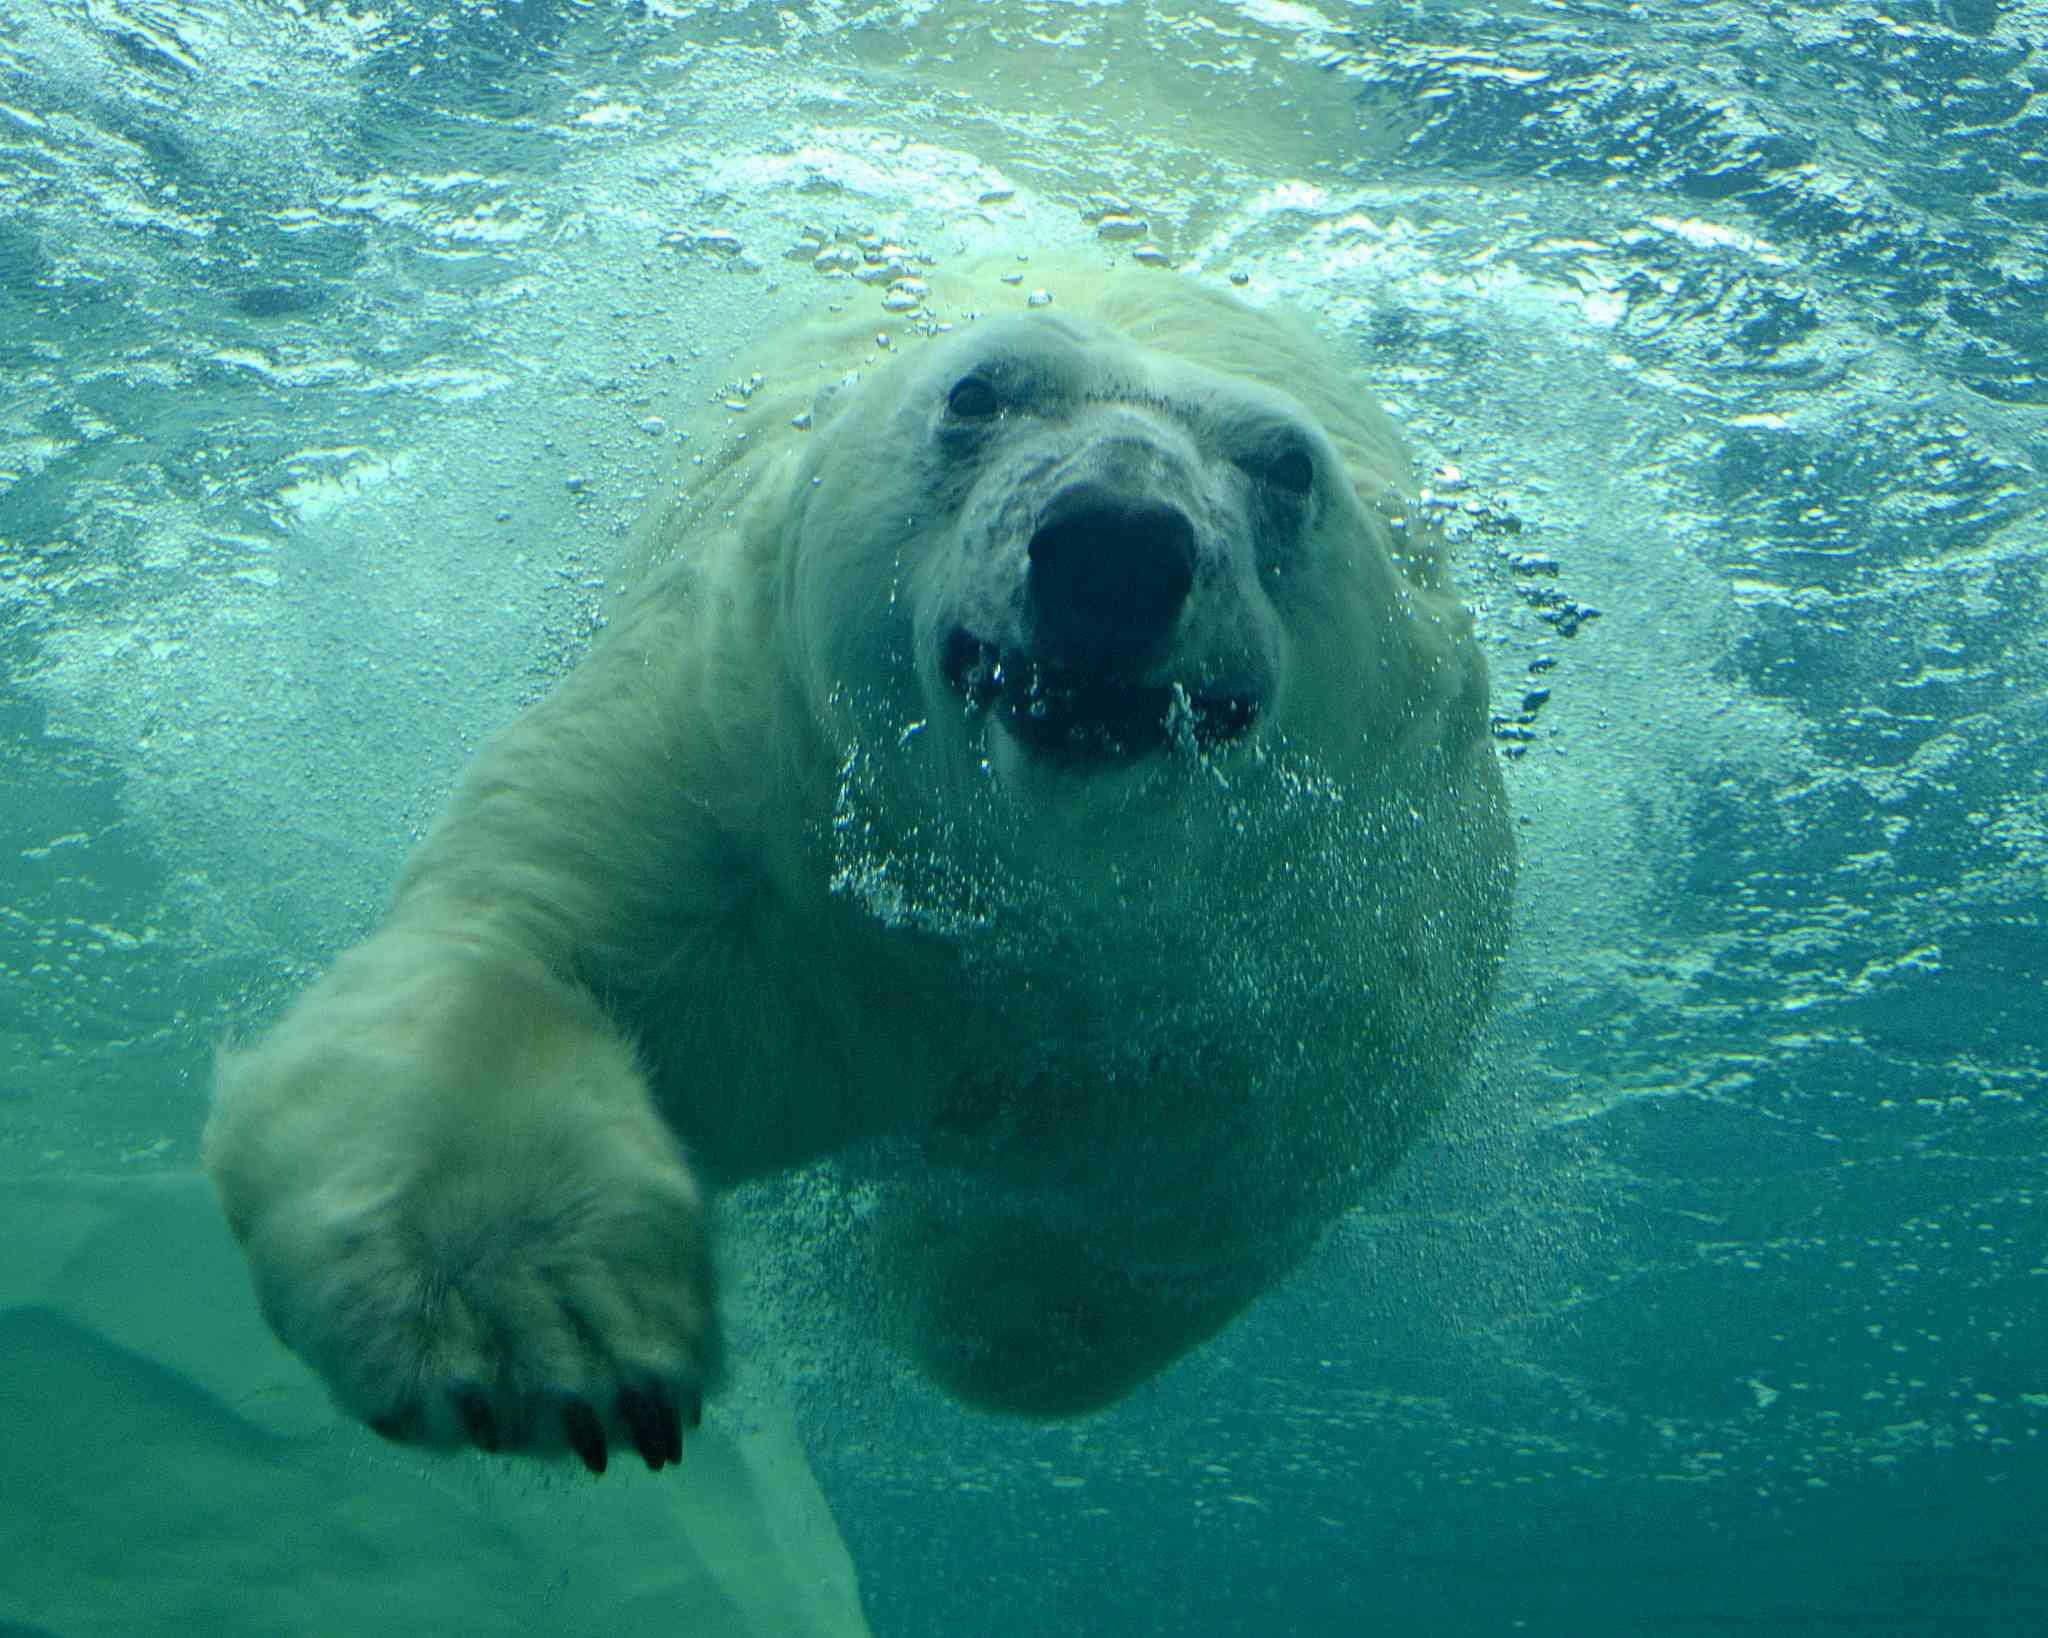 Polar bear swimming underwater looking at camera.